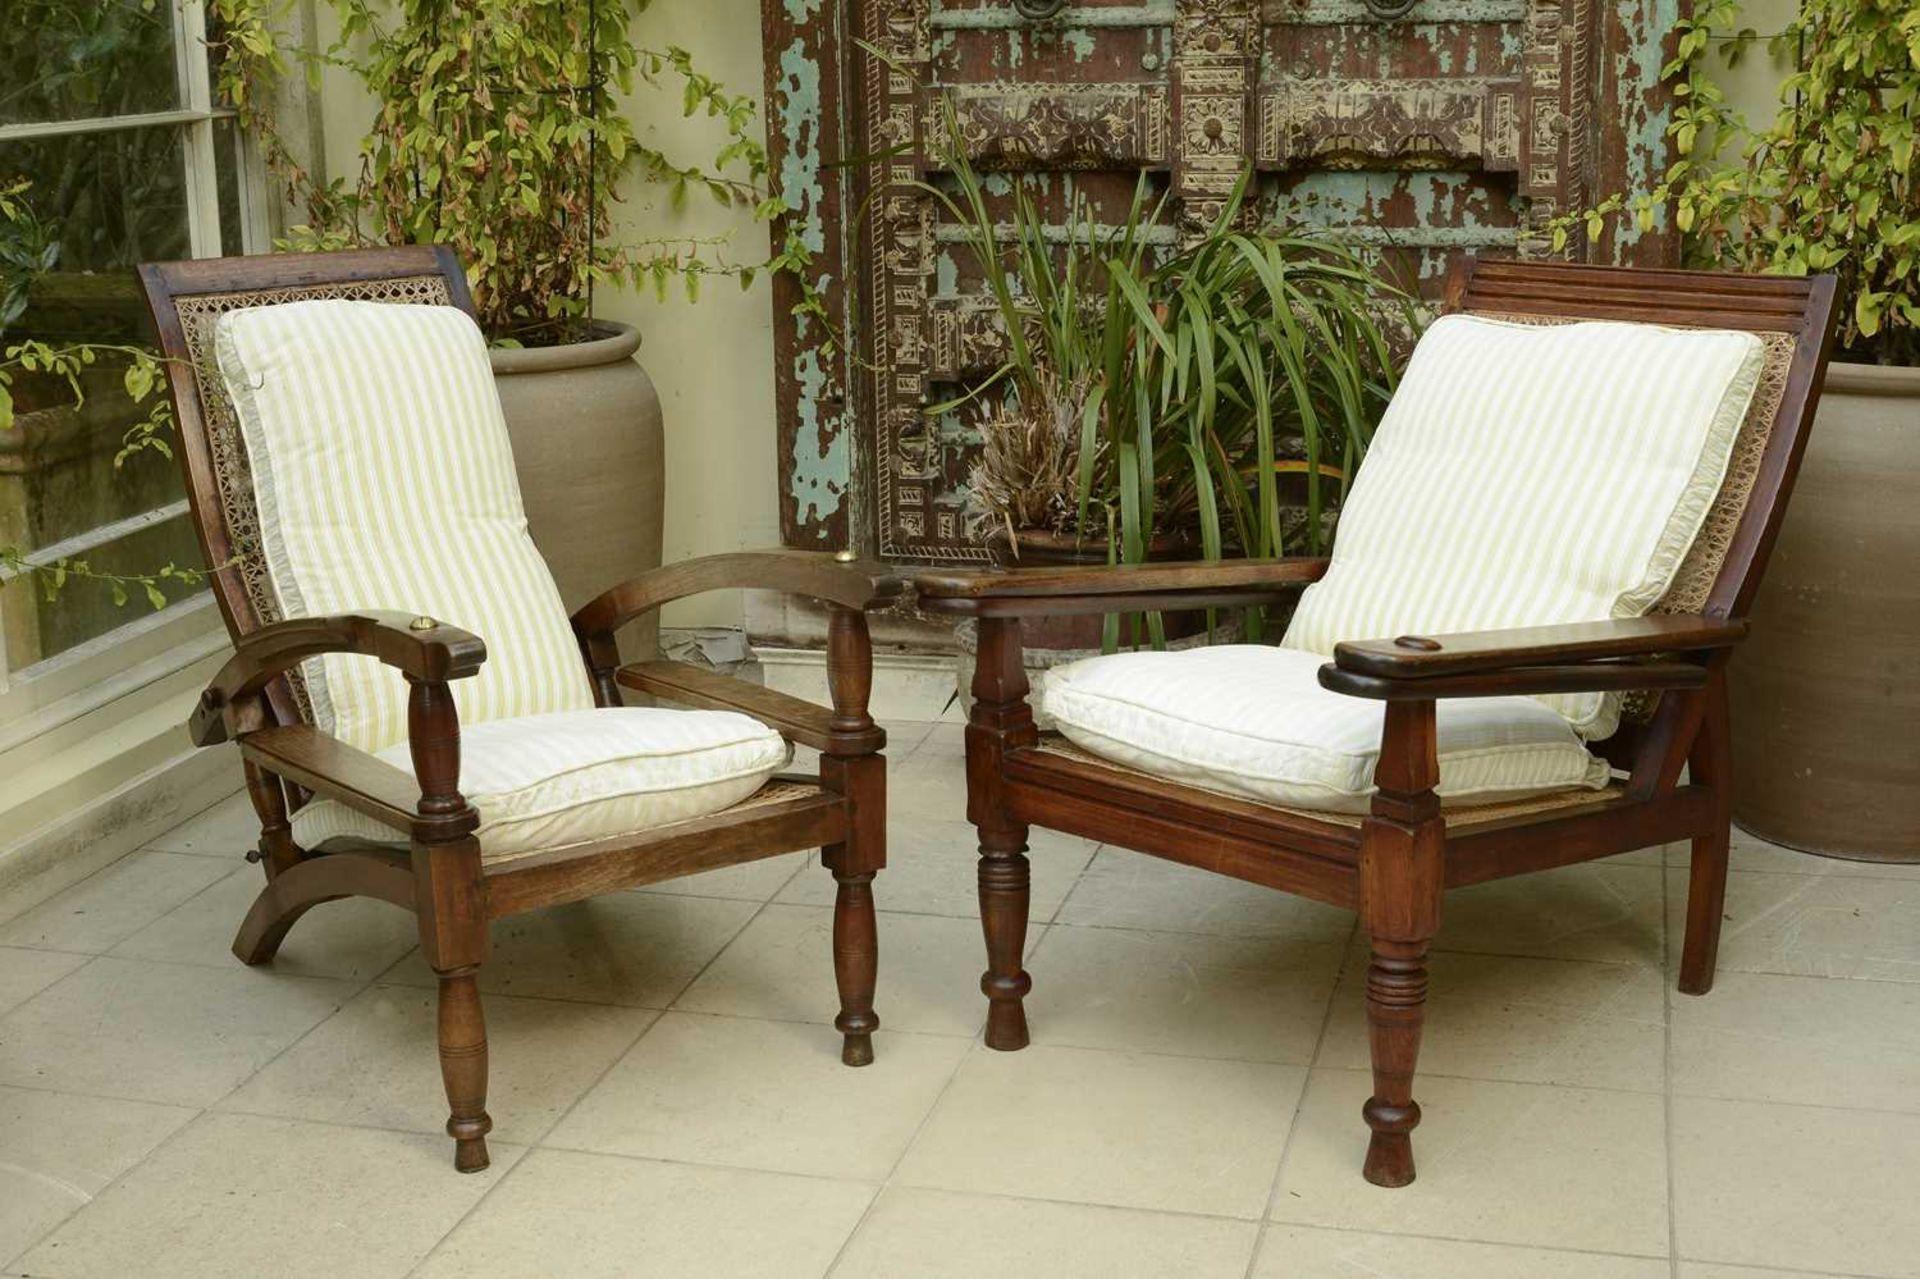 Two similar teak planter's chairs,